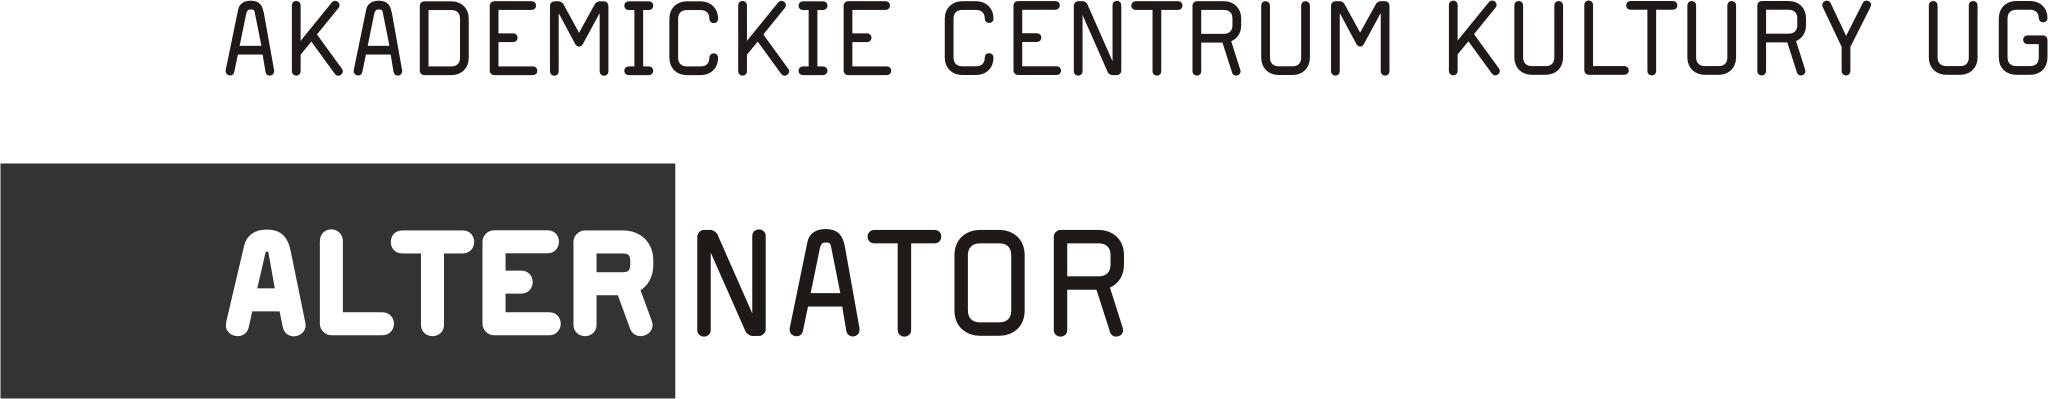 logo alternator akademickie centrum kultury ug 110916